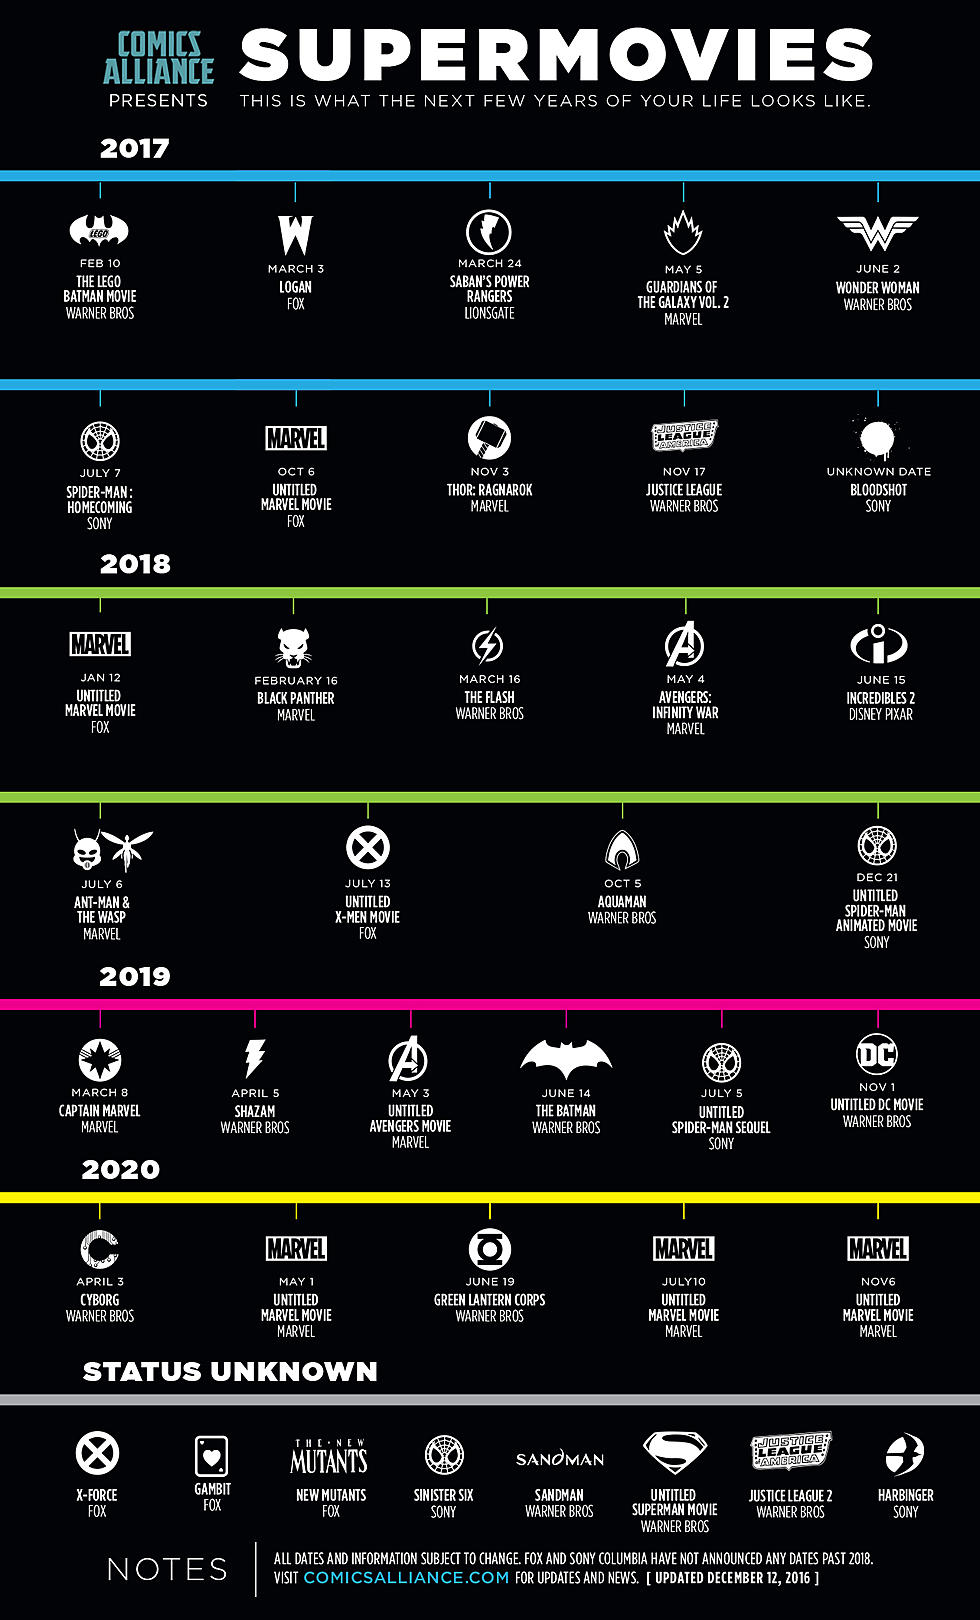 2019 Movie Calendar ComicsAlliance Presents The Supermovies Infographic